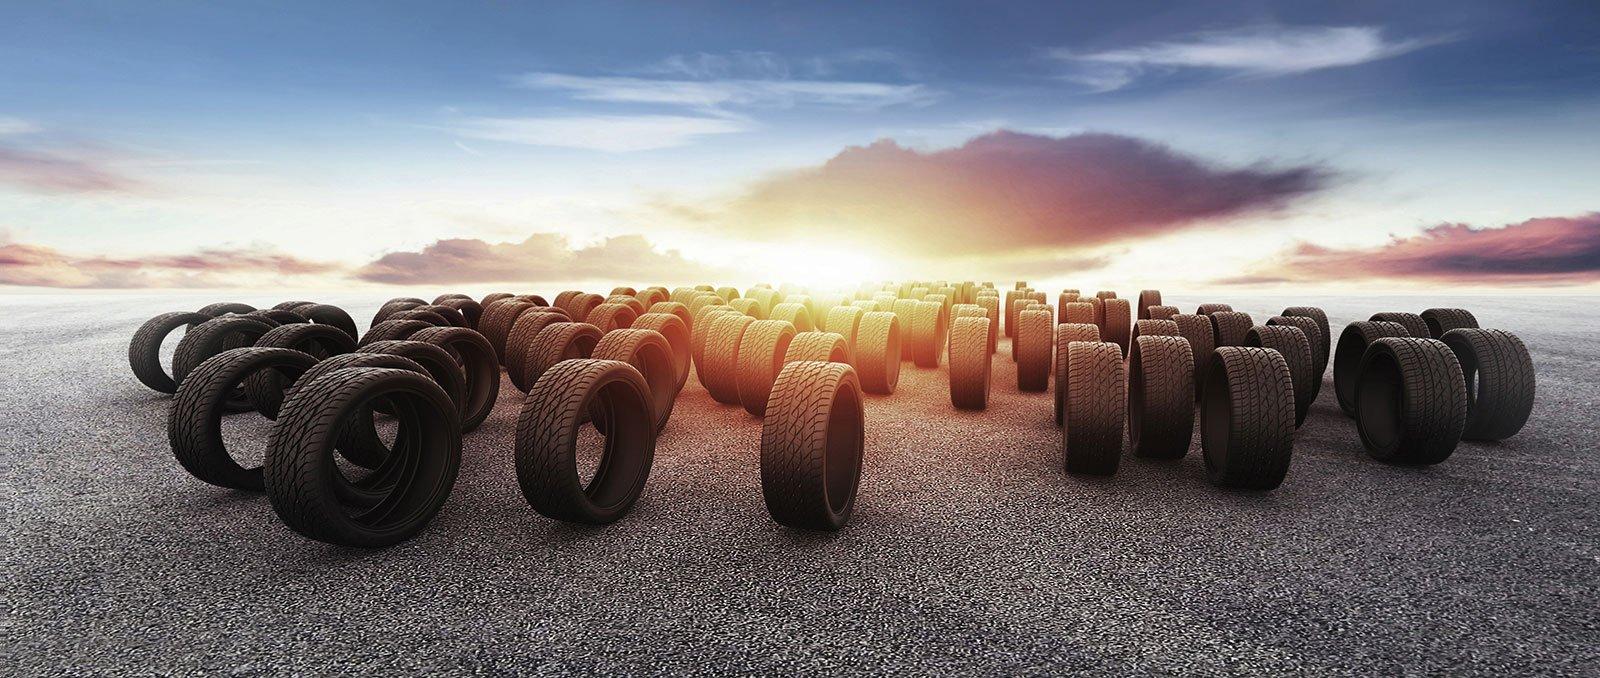 pneumatici su strada e tramonto